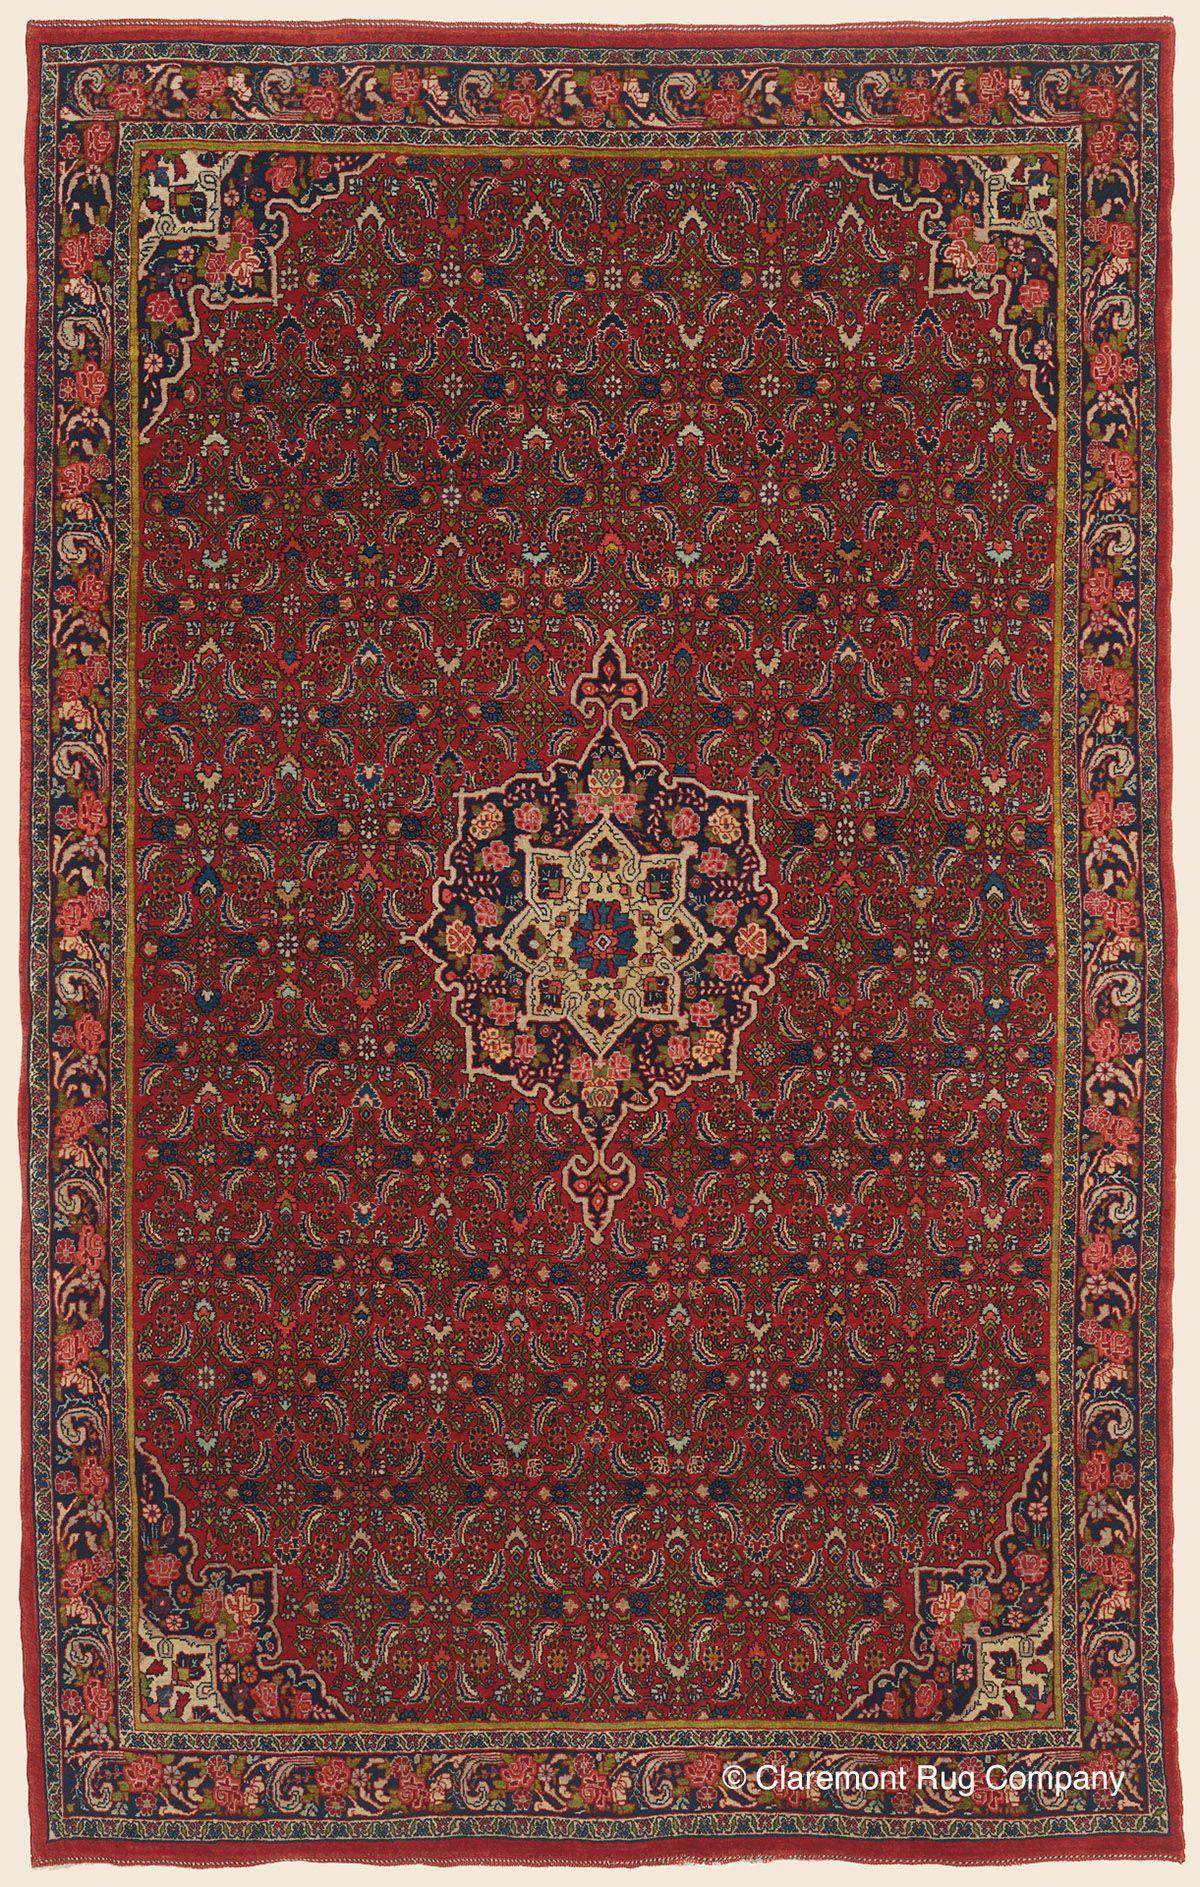 Halvai Bijar Northwest Persian Antique Rug Claremont Company